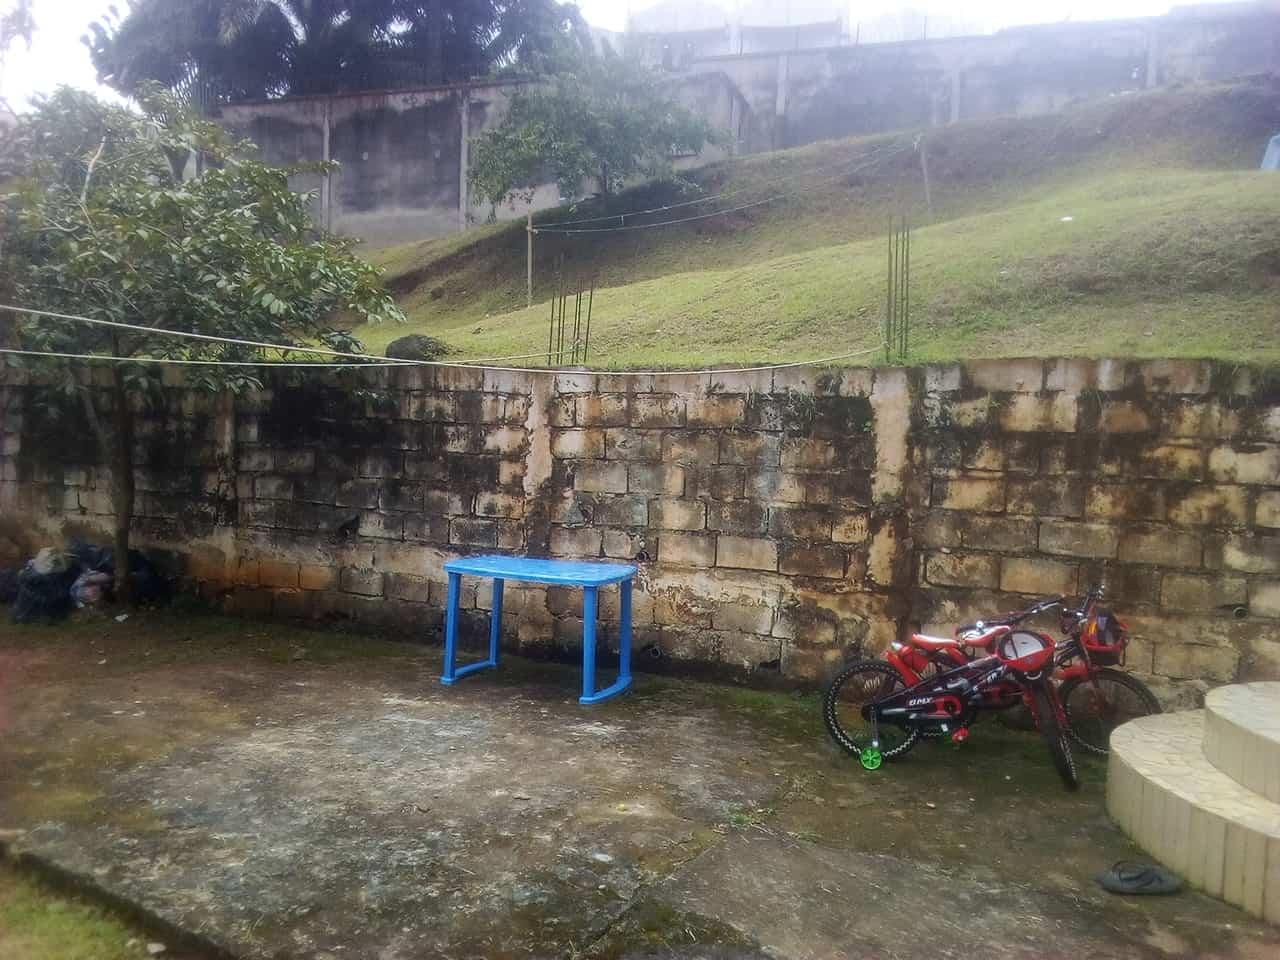 Land for sale at Yaoundé, Bastos, pas loin de lambassade ditalie - 600 m2 - 200 000 000 FCFA